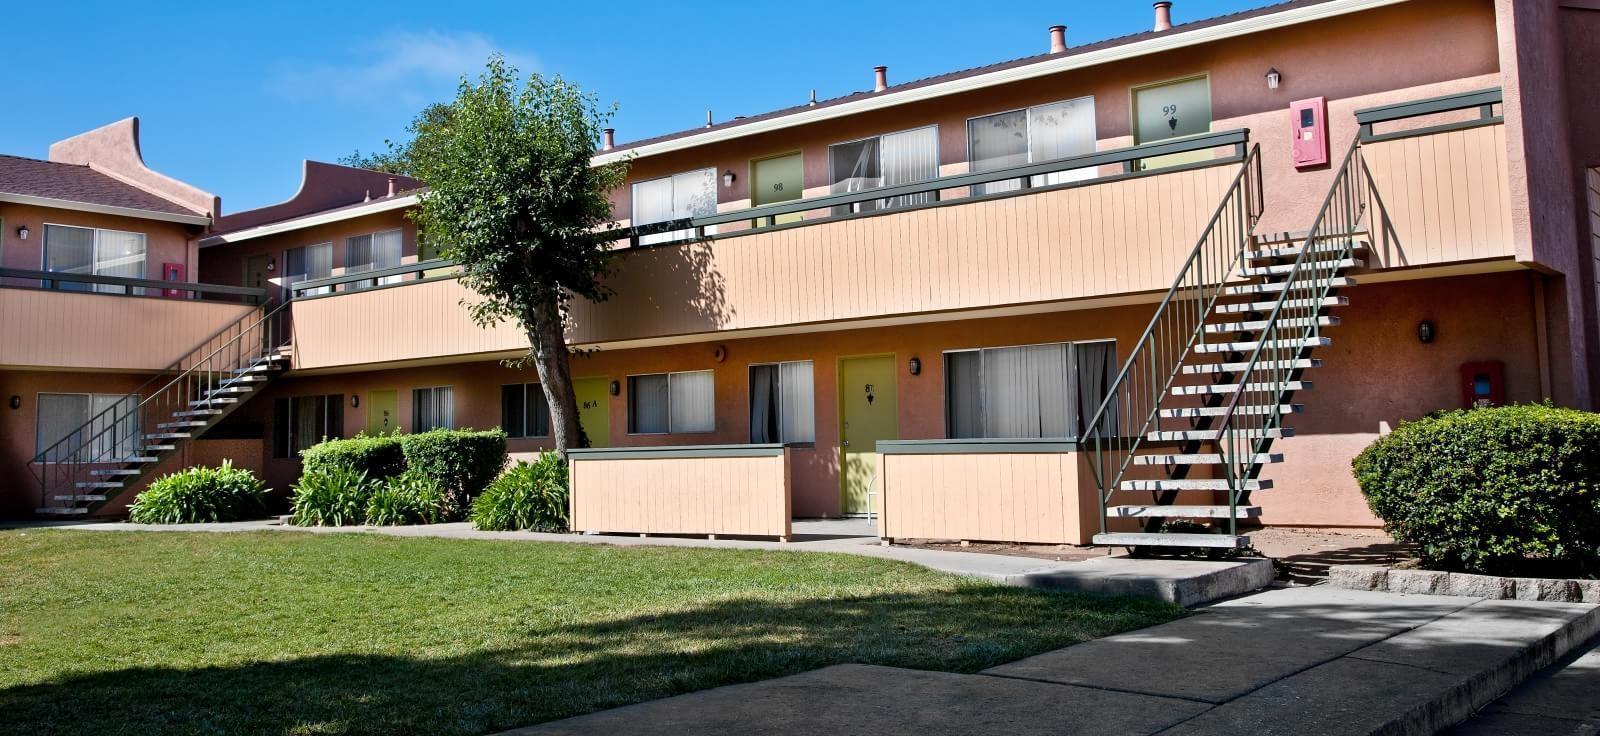 Boronda Manor Apartments photo #1